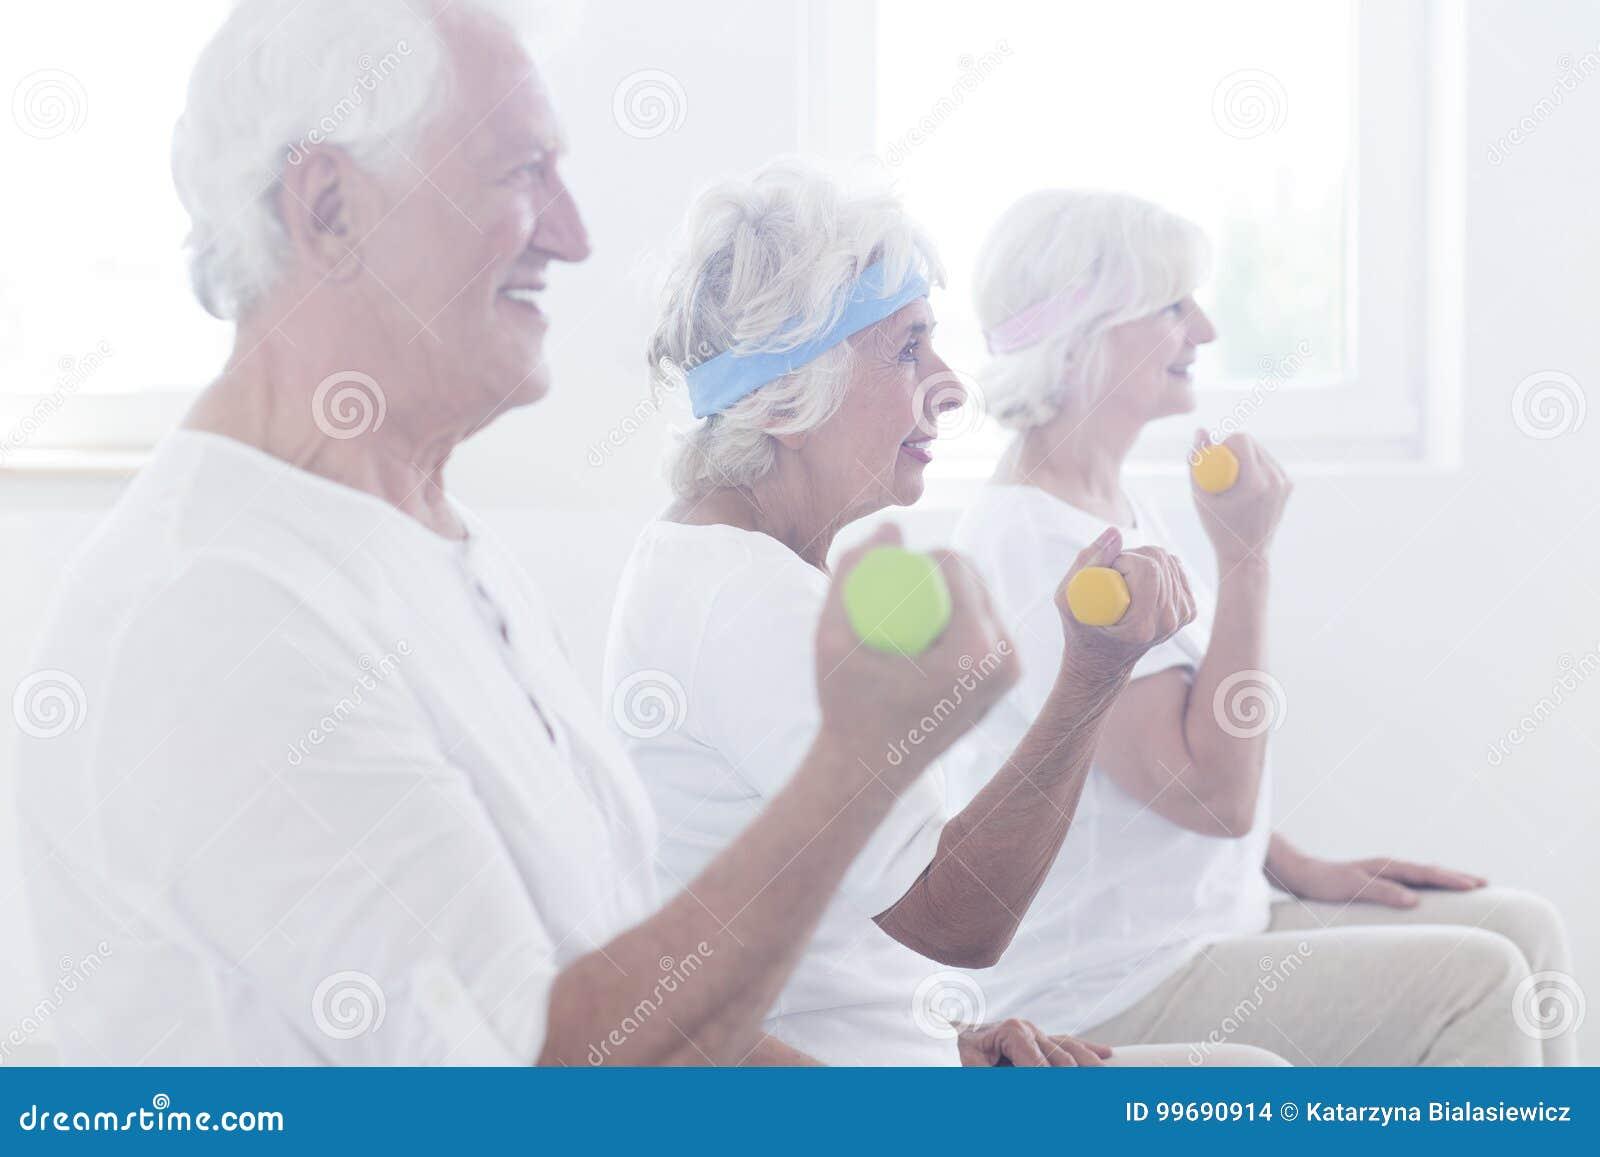 preventing falls in the elderly 2015-1-21 各位记者,大家新年好。今年第一次例行发布会在这里给大家发布,很高兴再次和大家见面。通报一些情况,并且回答大家的问题,今年这次发布会,因为是全年.